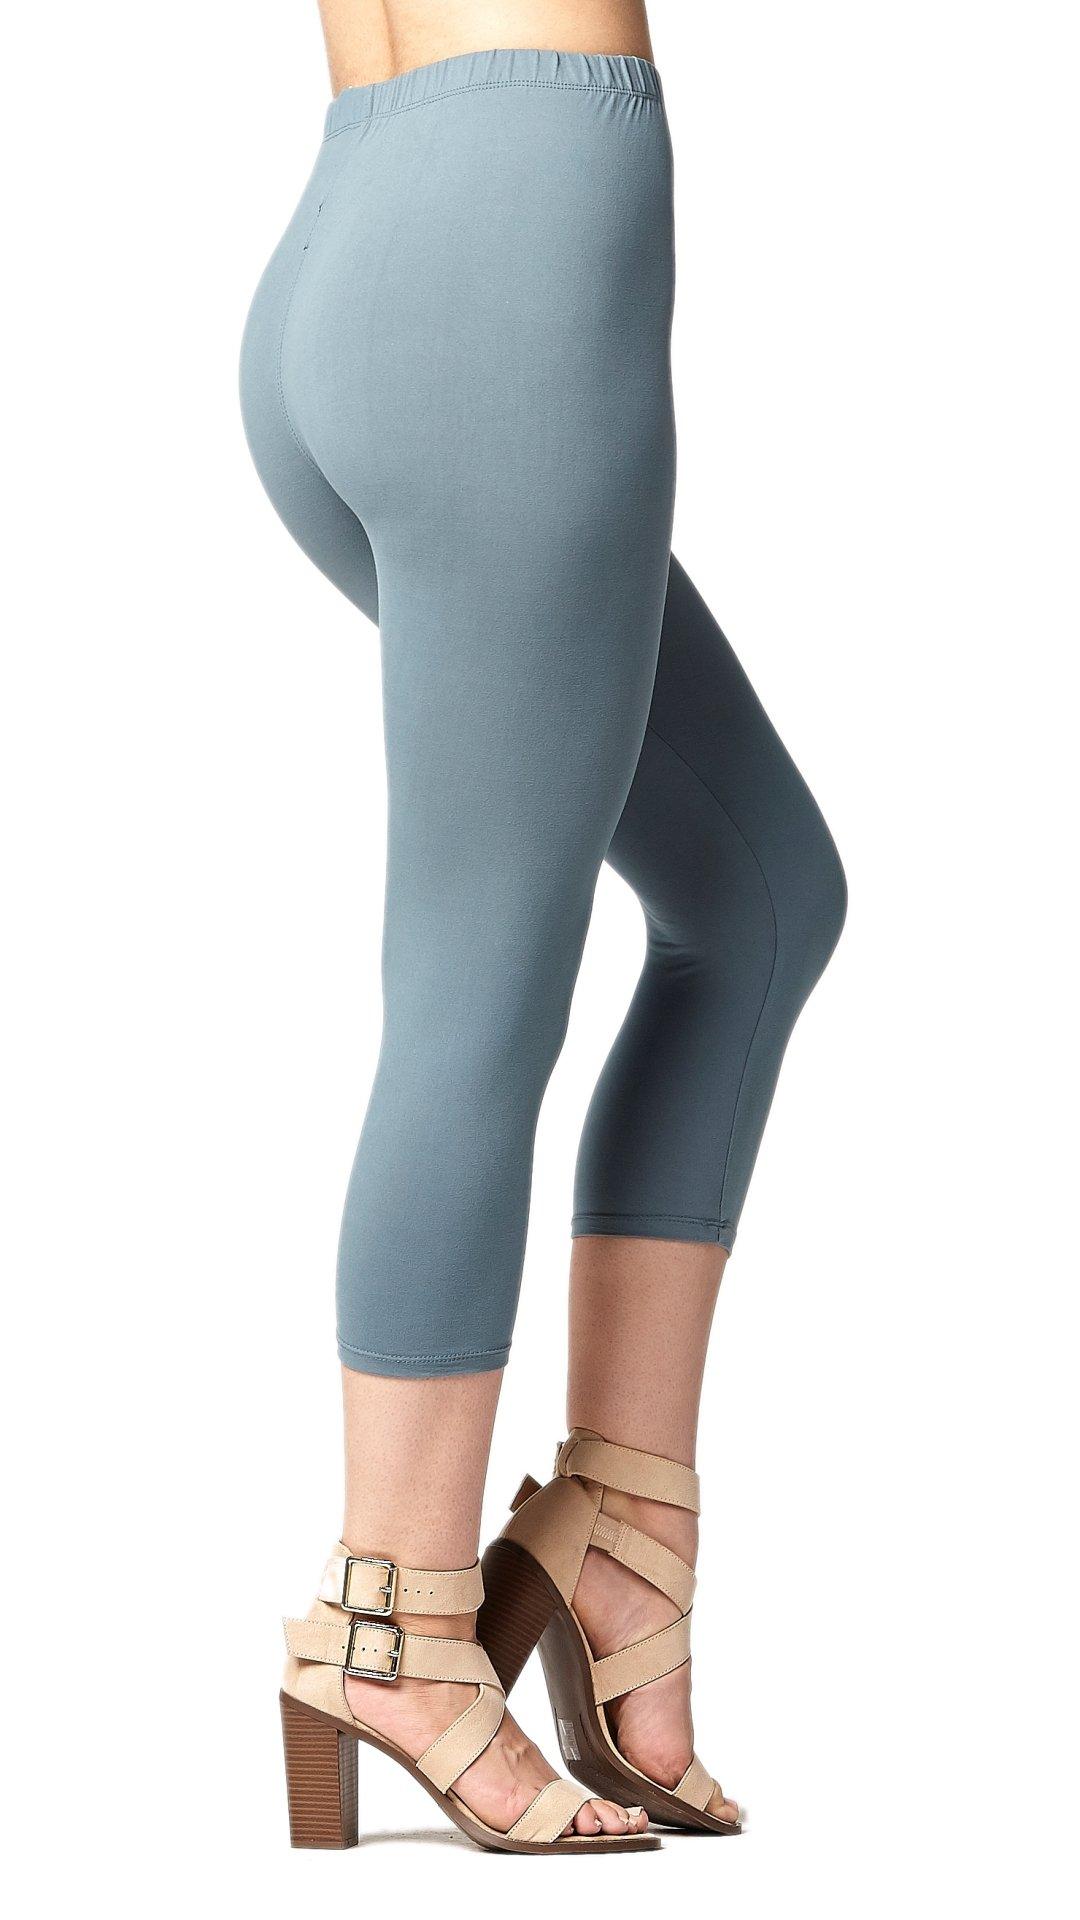 Conceited Premium Ultra Soft Women's Capri Cropped Leggings - High Waist - 20 Colors 2 Sizes Plus Size (12-24), Sea Foam